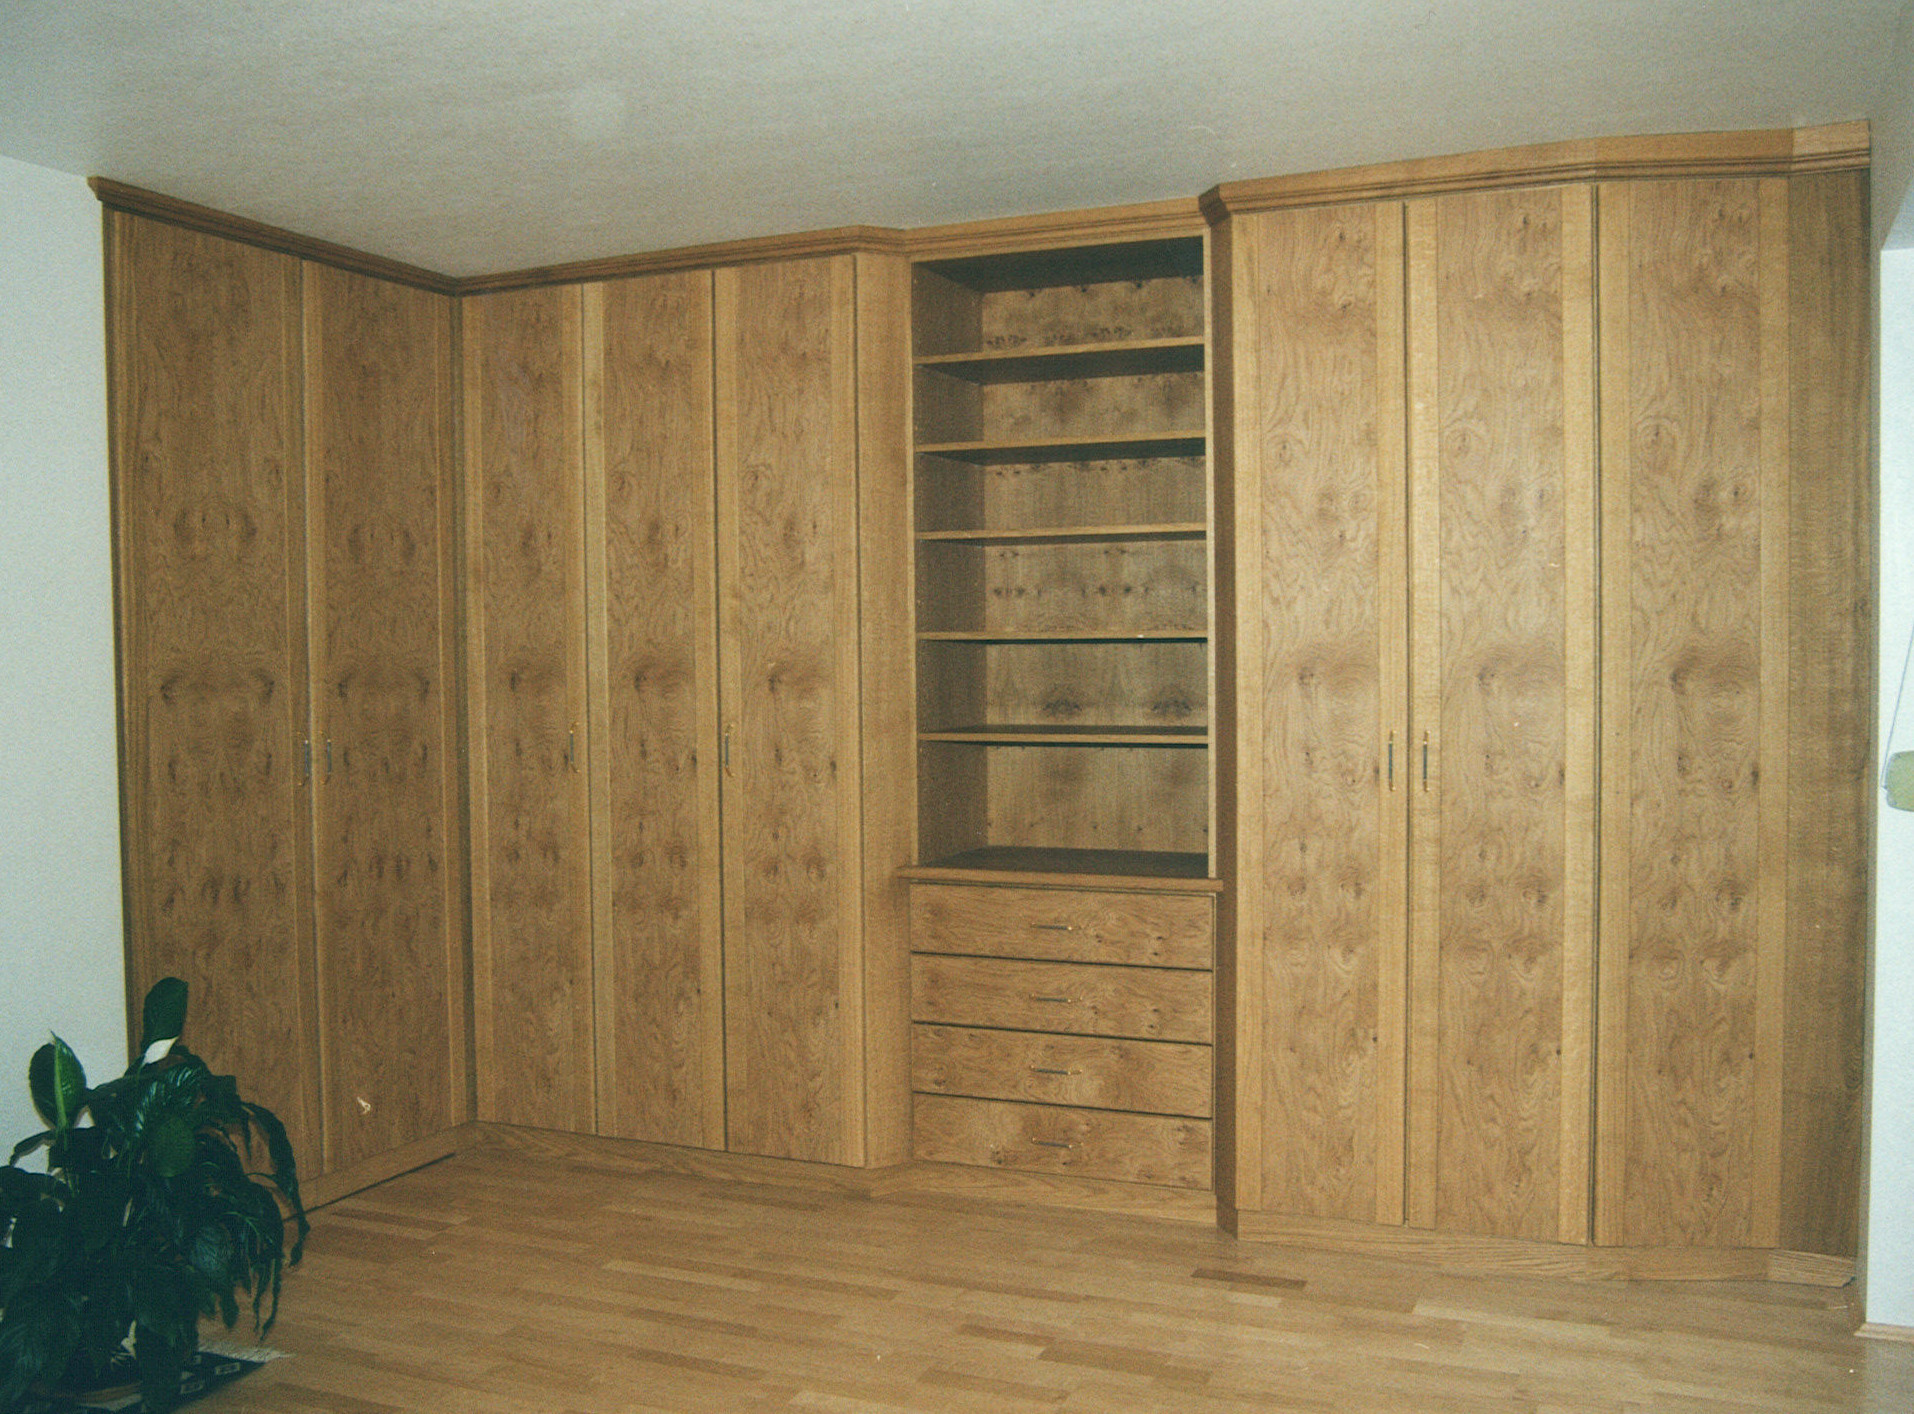 ikea malm einrichtungstipps. Black Bedroom Furniture Sets. Home Design Ideas